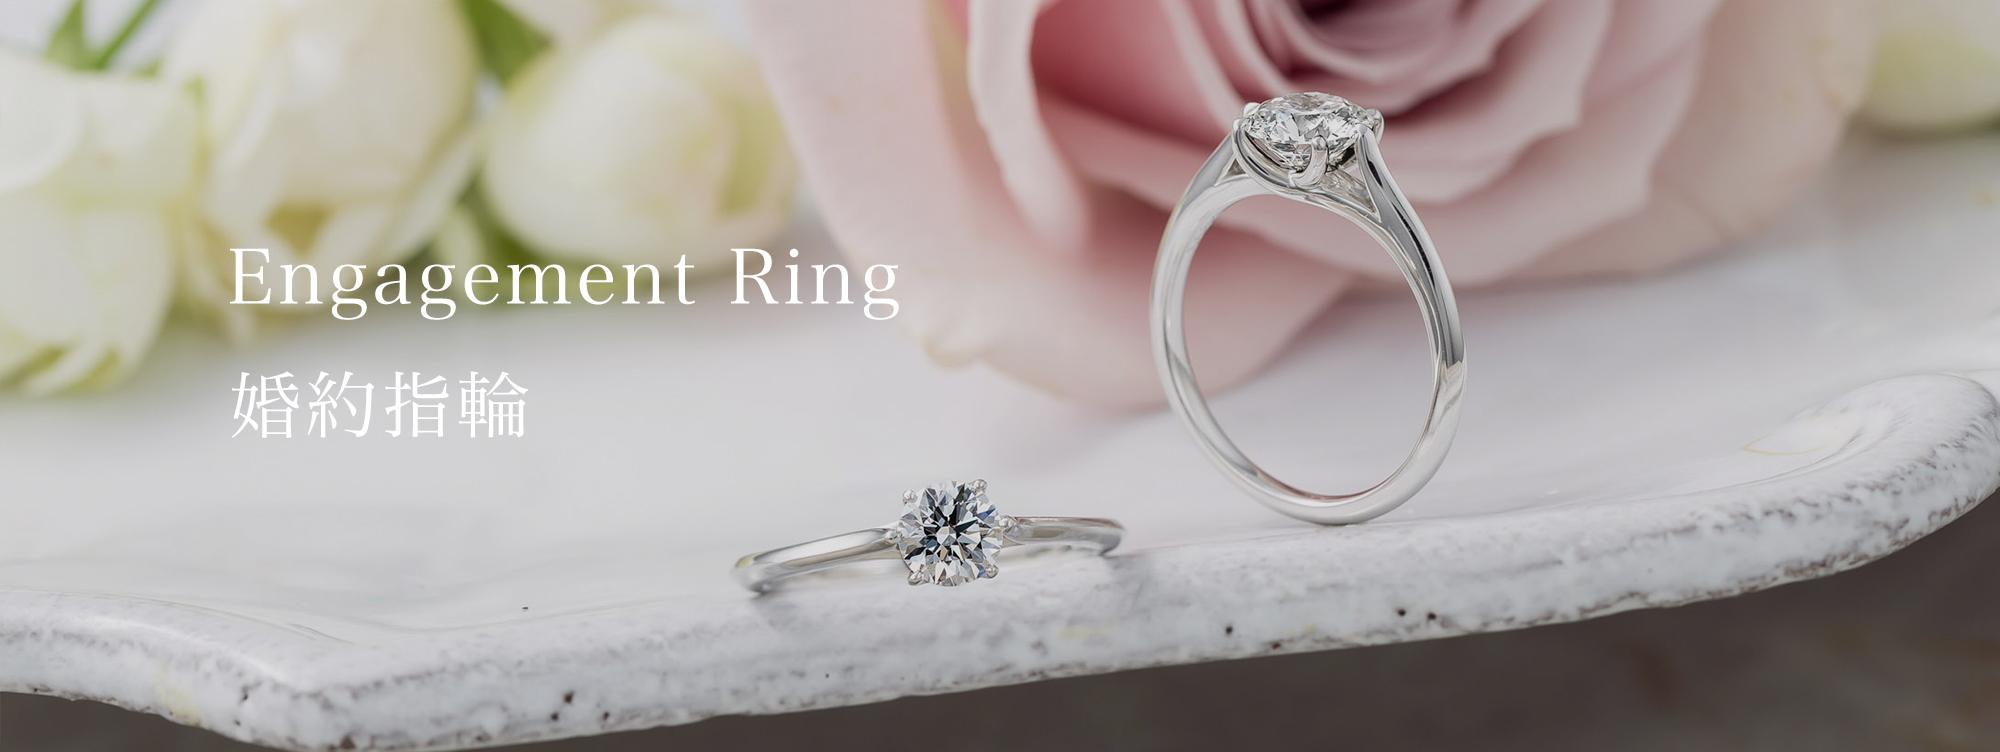 Engagemet Ring 婚約指輪